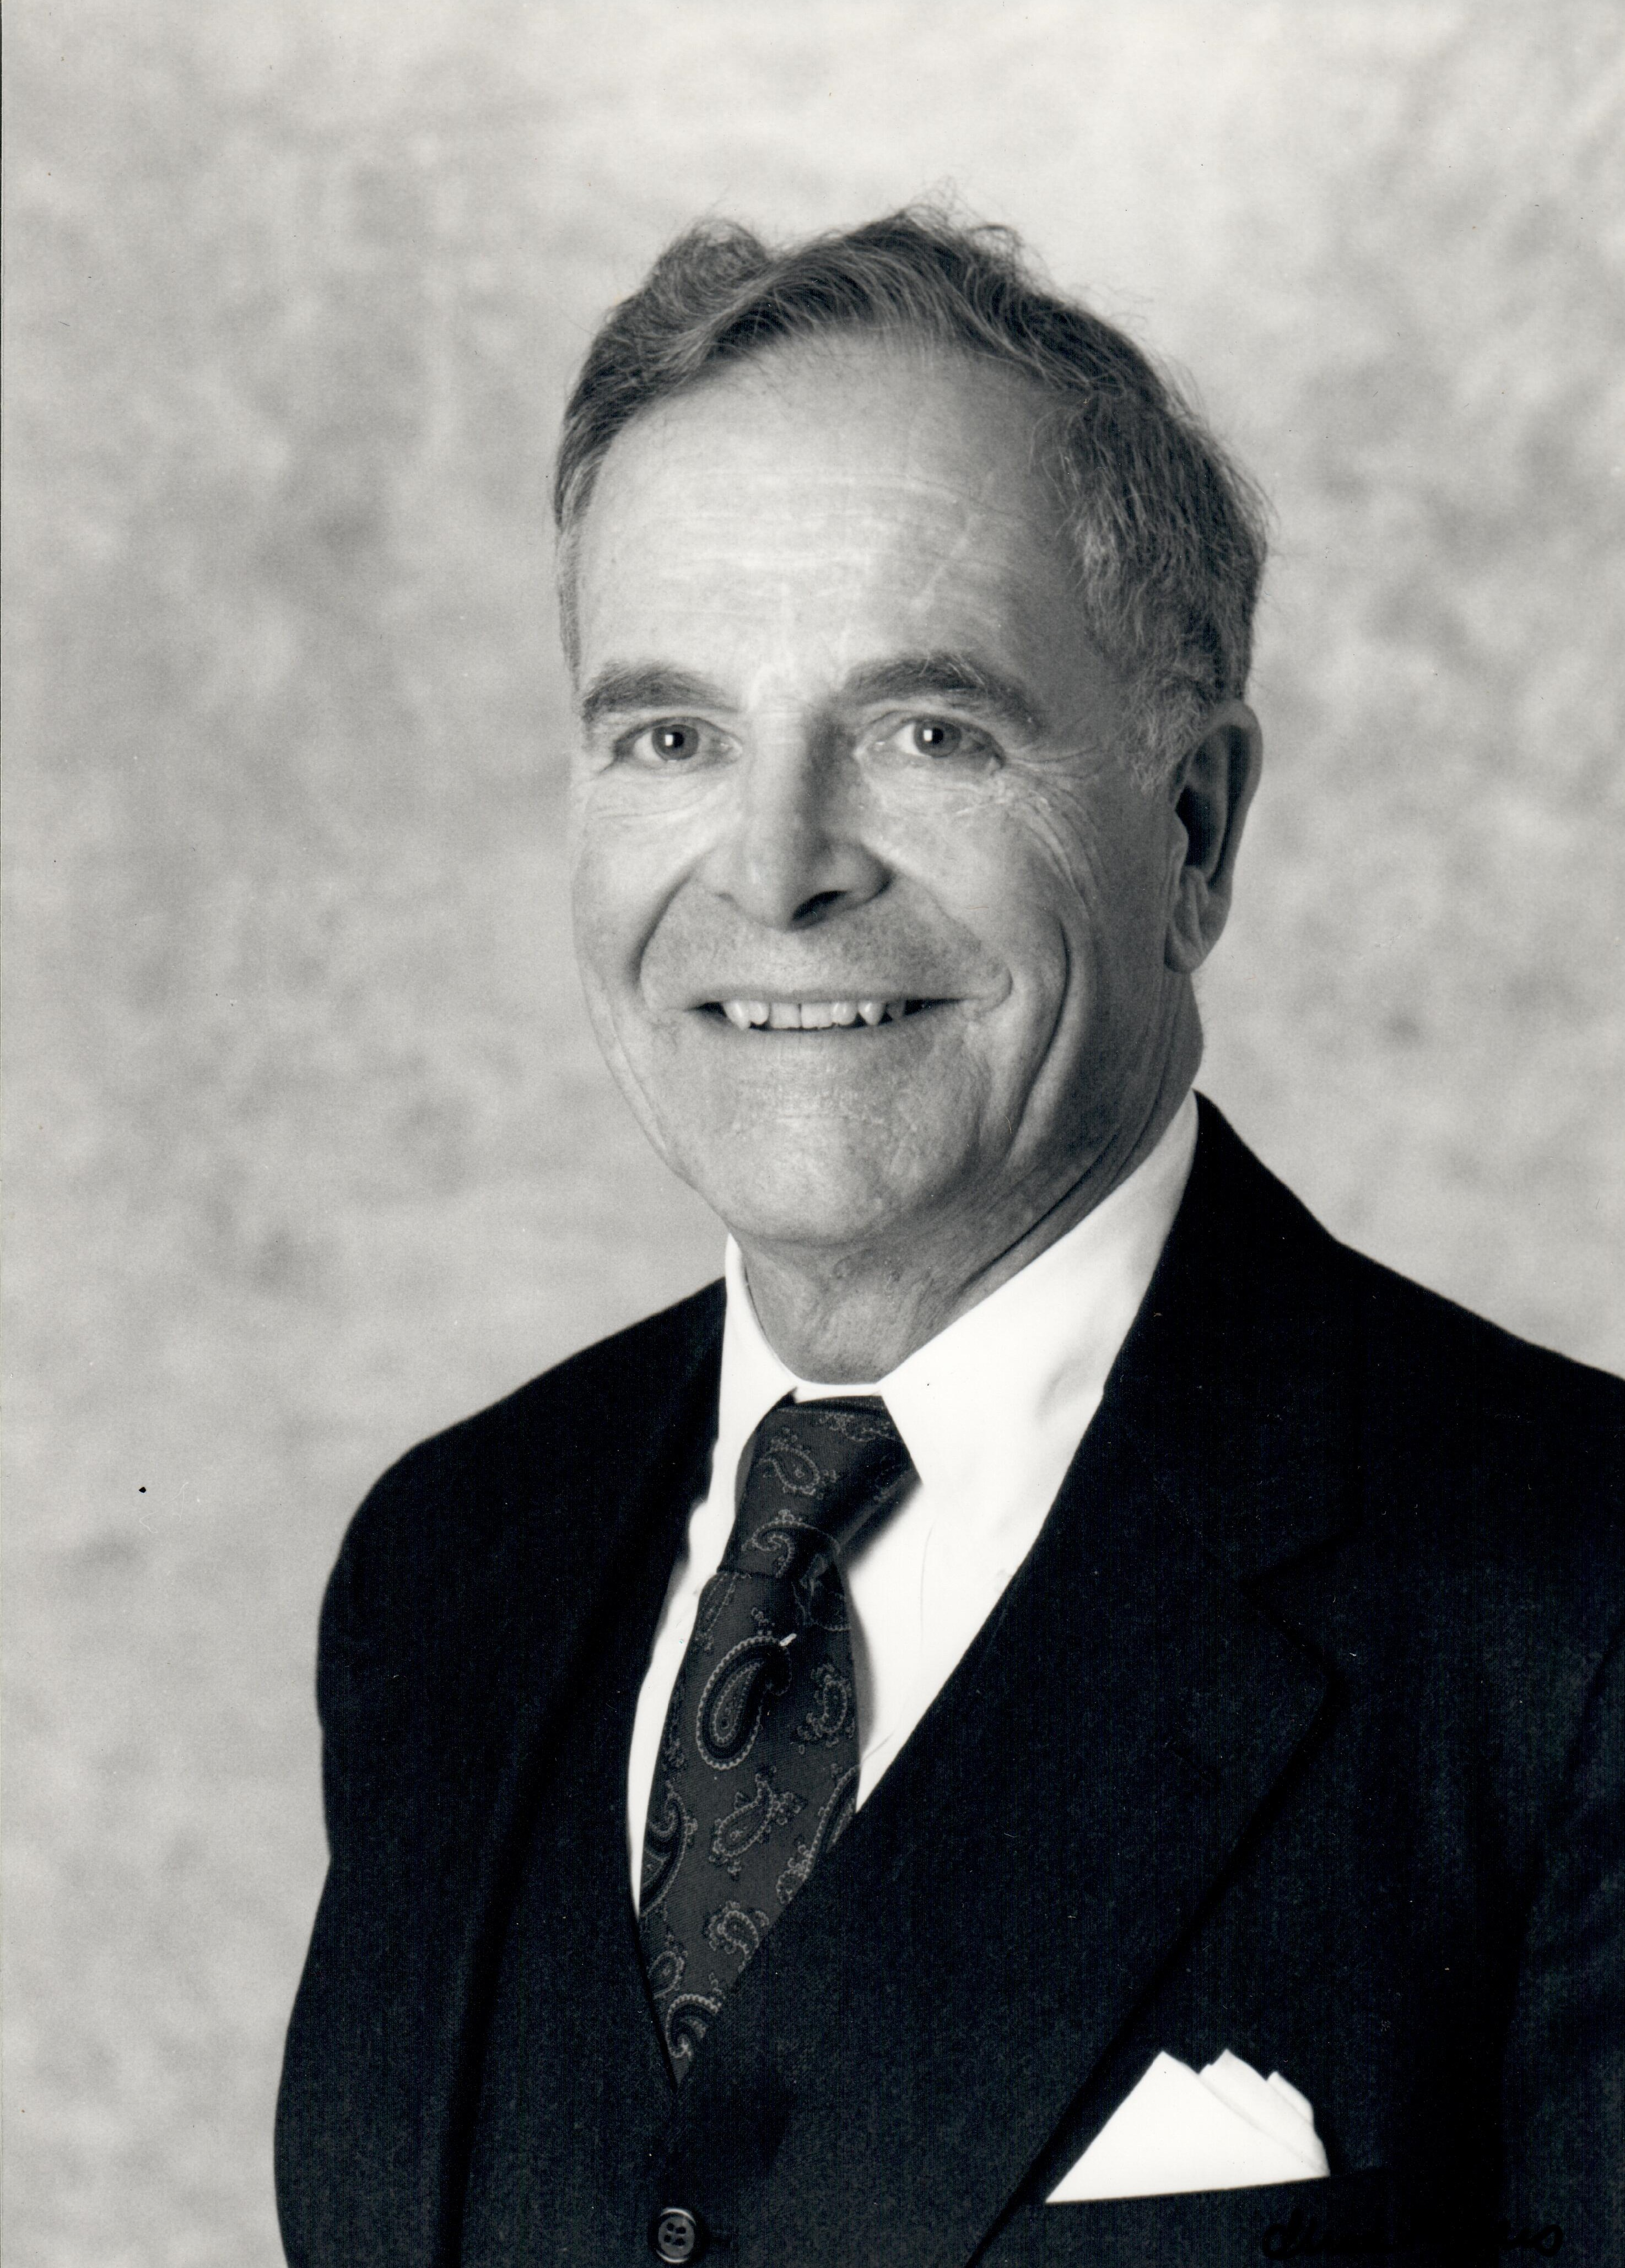 Johannes Robert Krahmer